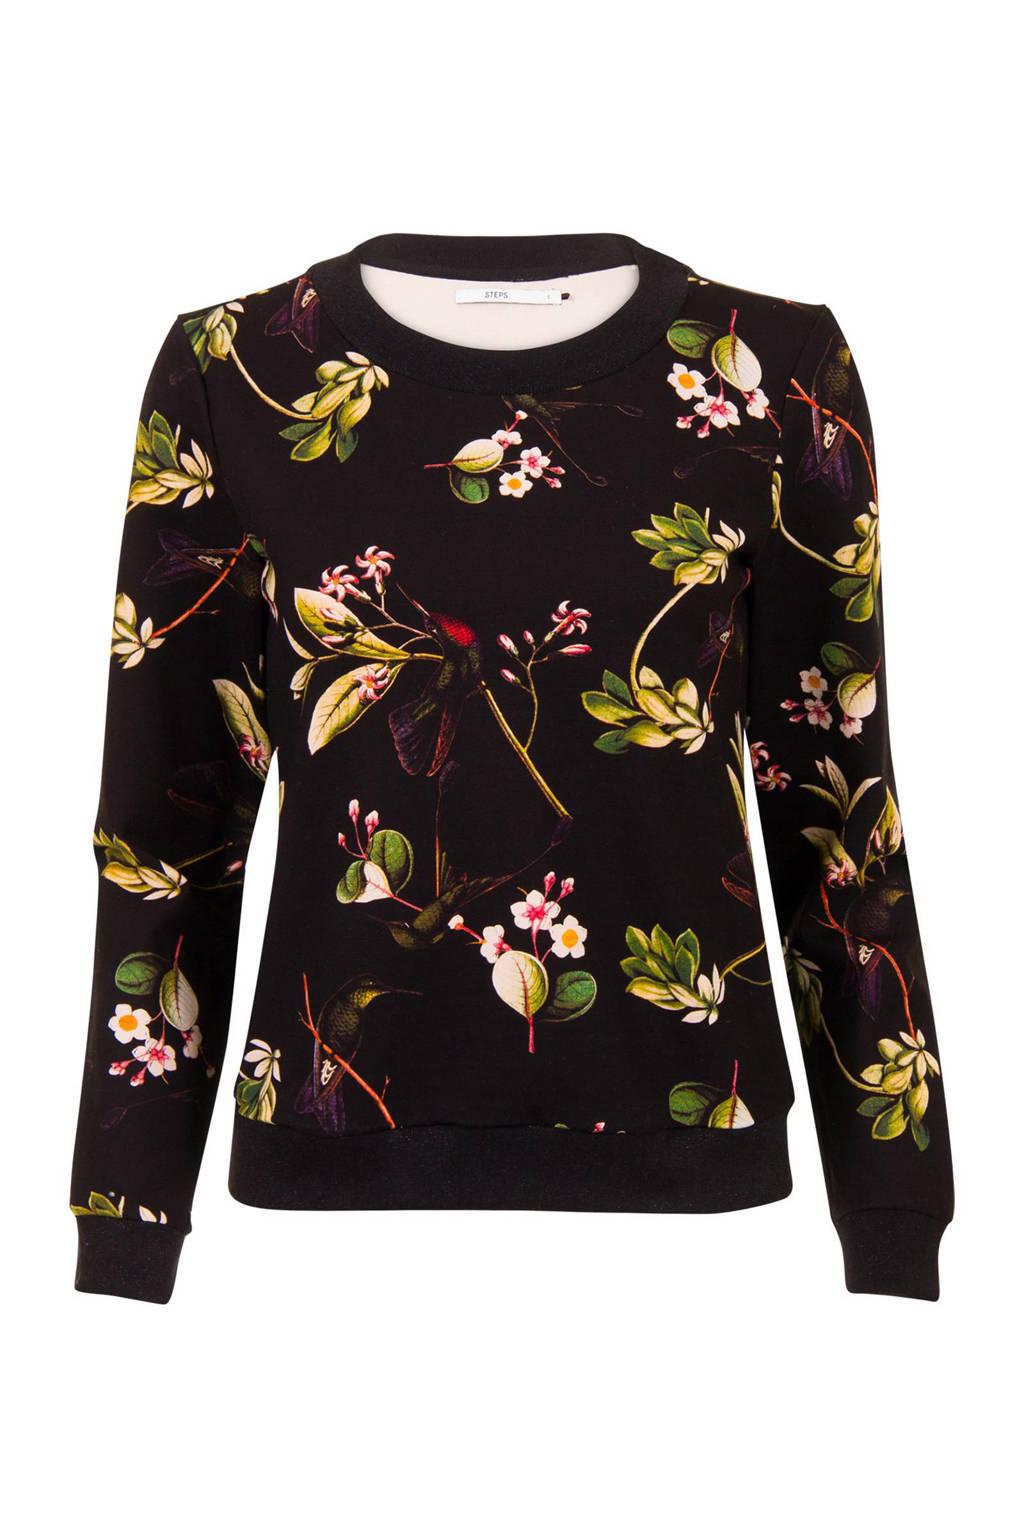 Trui Met Bloemenprint Dames.Steps Sweater Met Bloemenprint Wehkamp